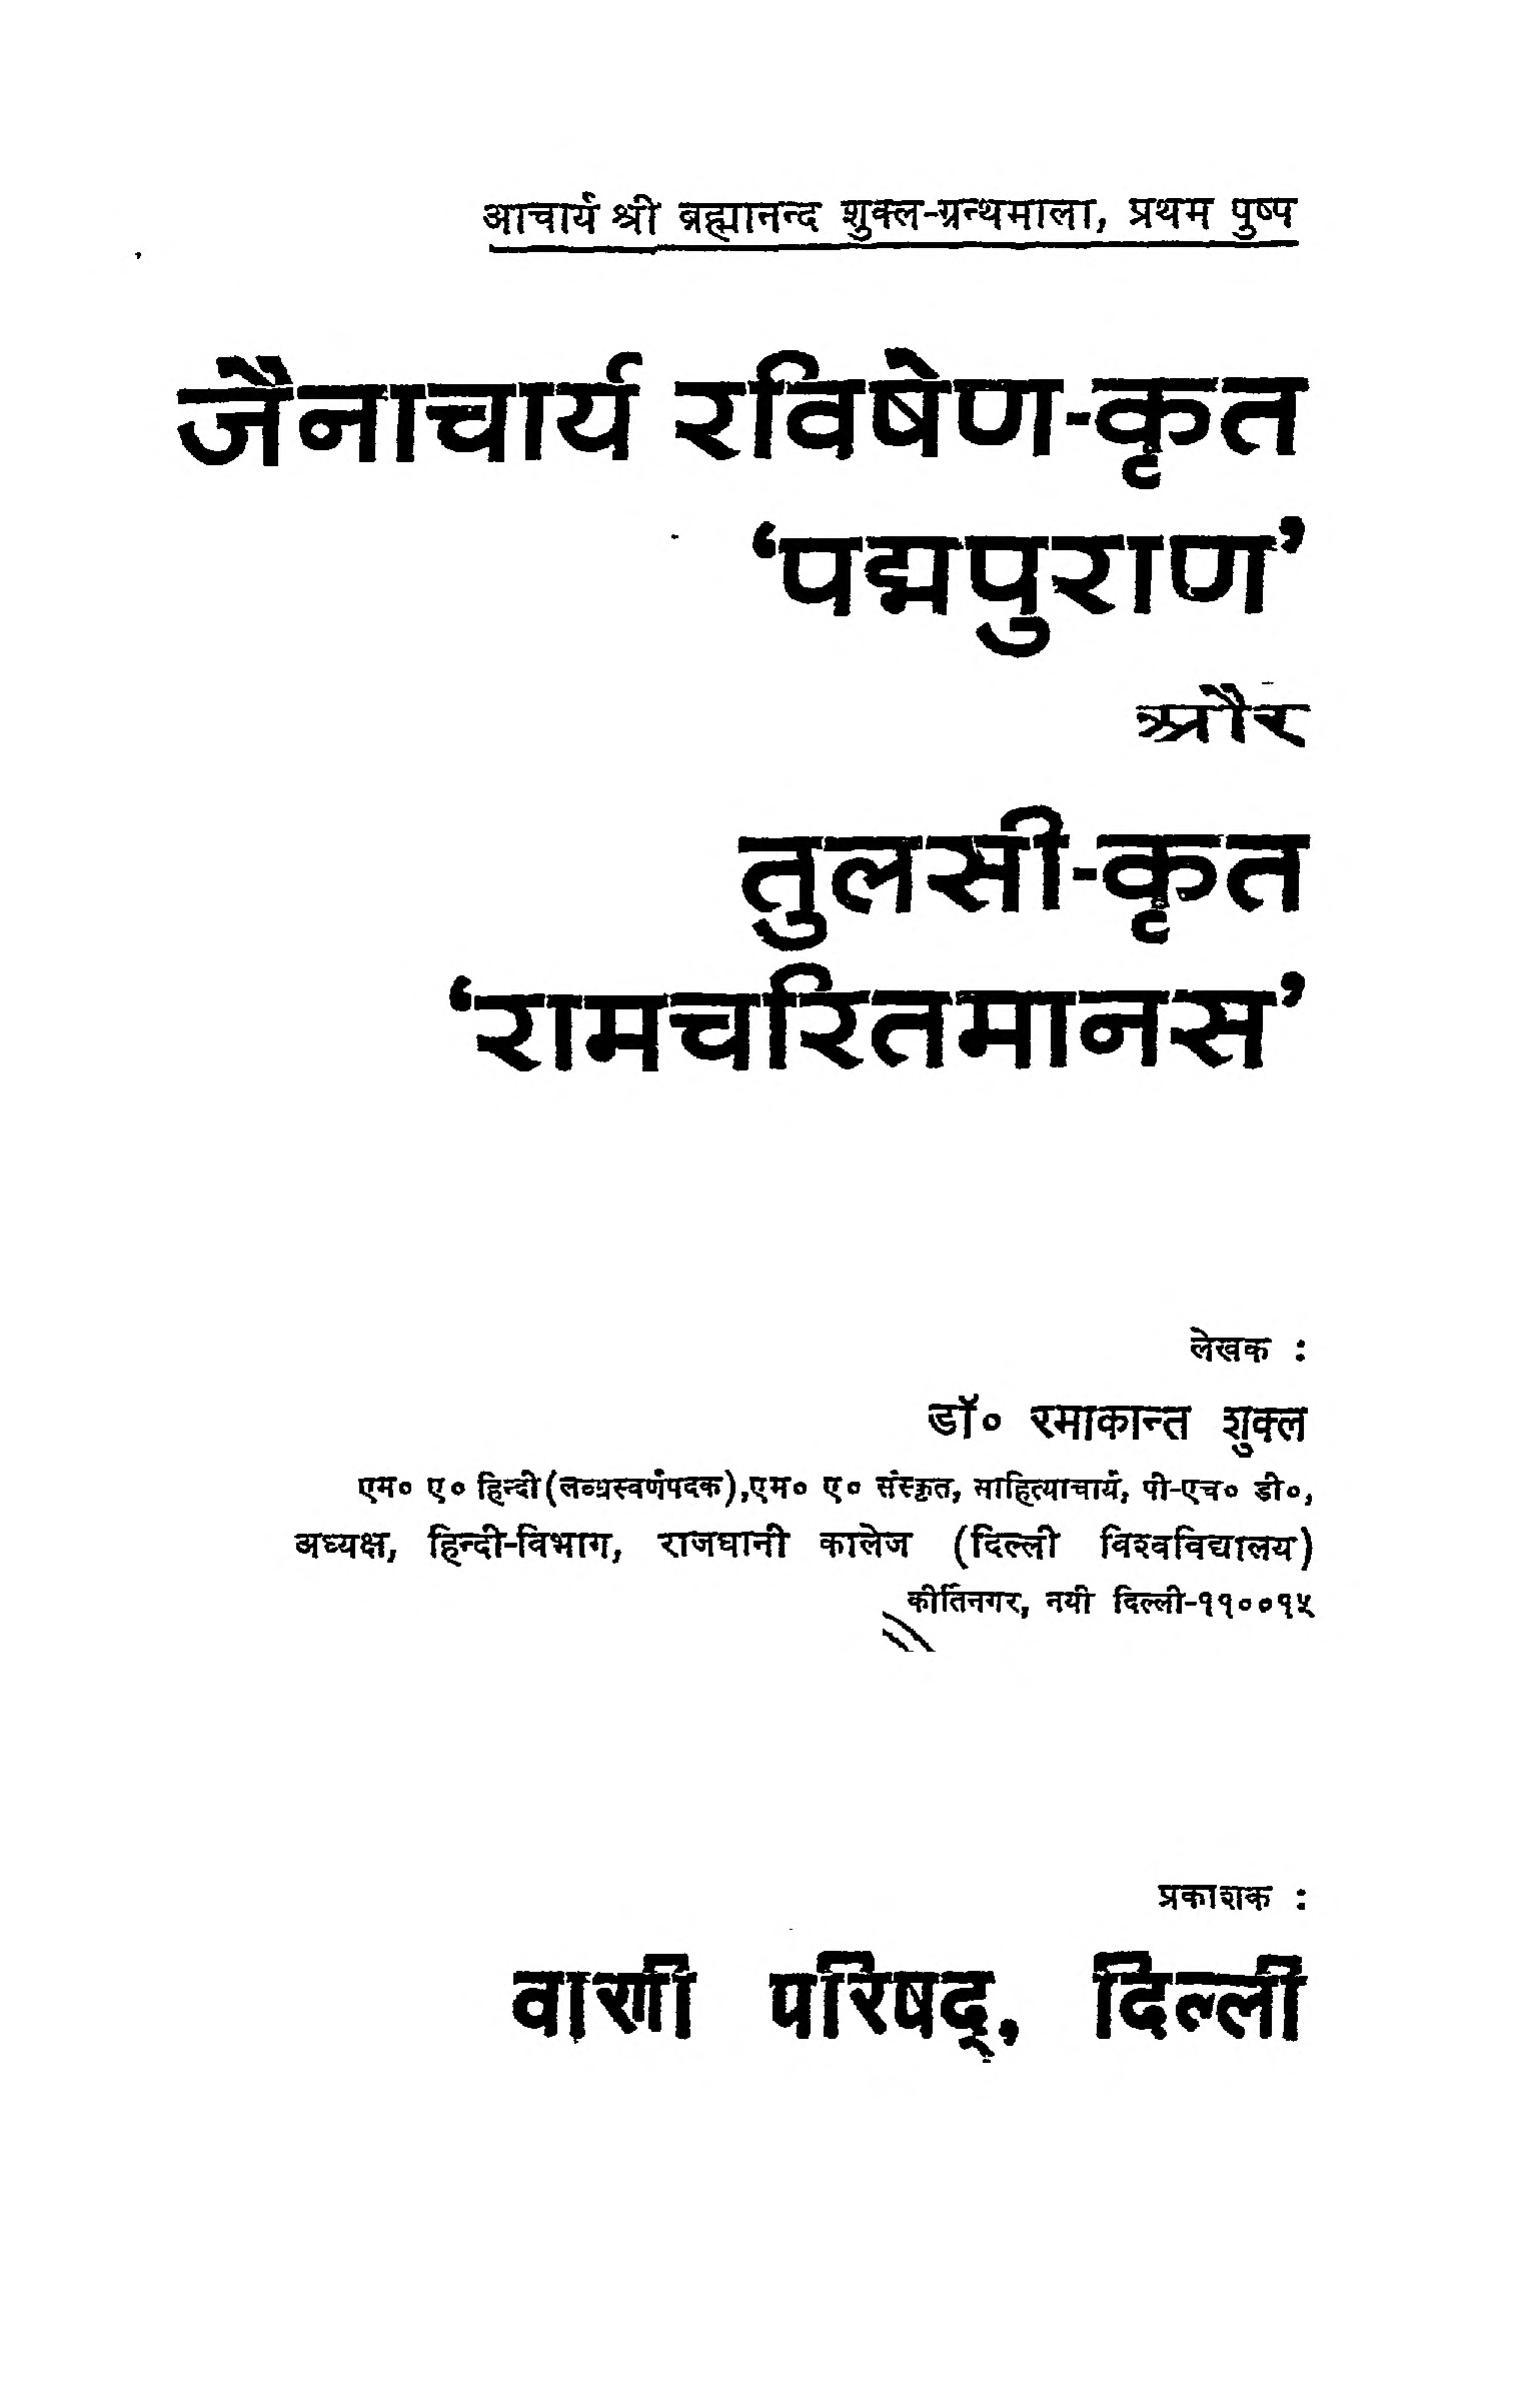 Book Image : जैनाचार्य रविषेण कृत 'पद्मपुराण' और तुलसी कृत 'रामचरितमानस' - Jainacharya Ravishen Krit Padmapuran Aur Tulasi Krit Ramcharitmanas